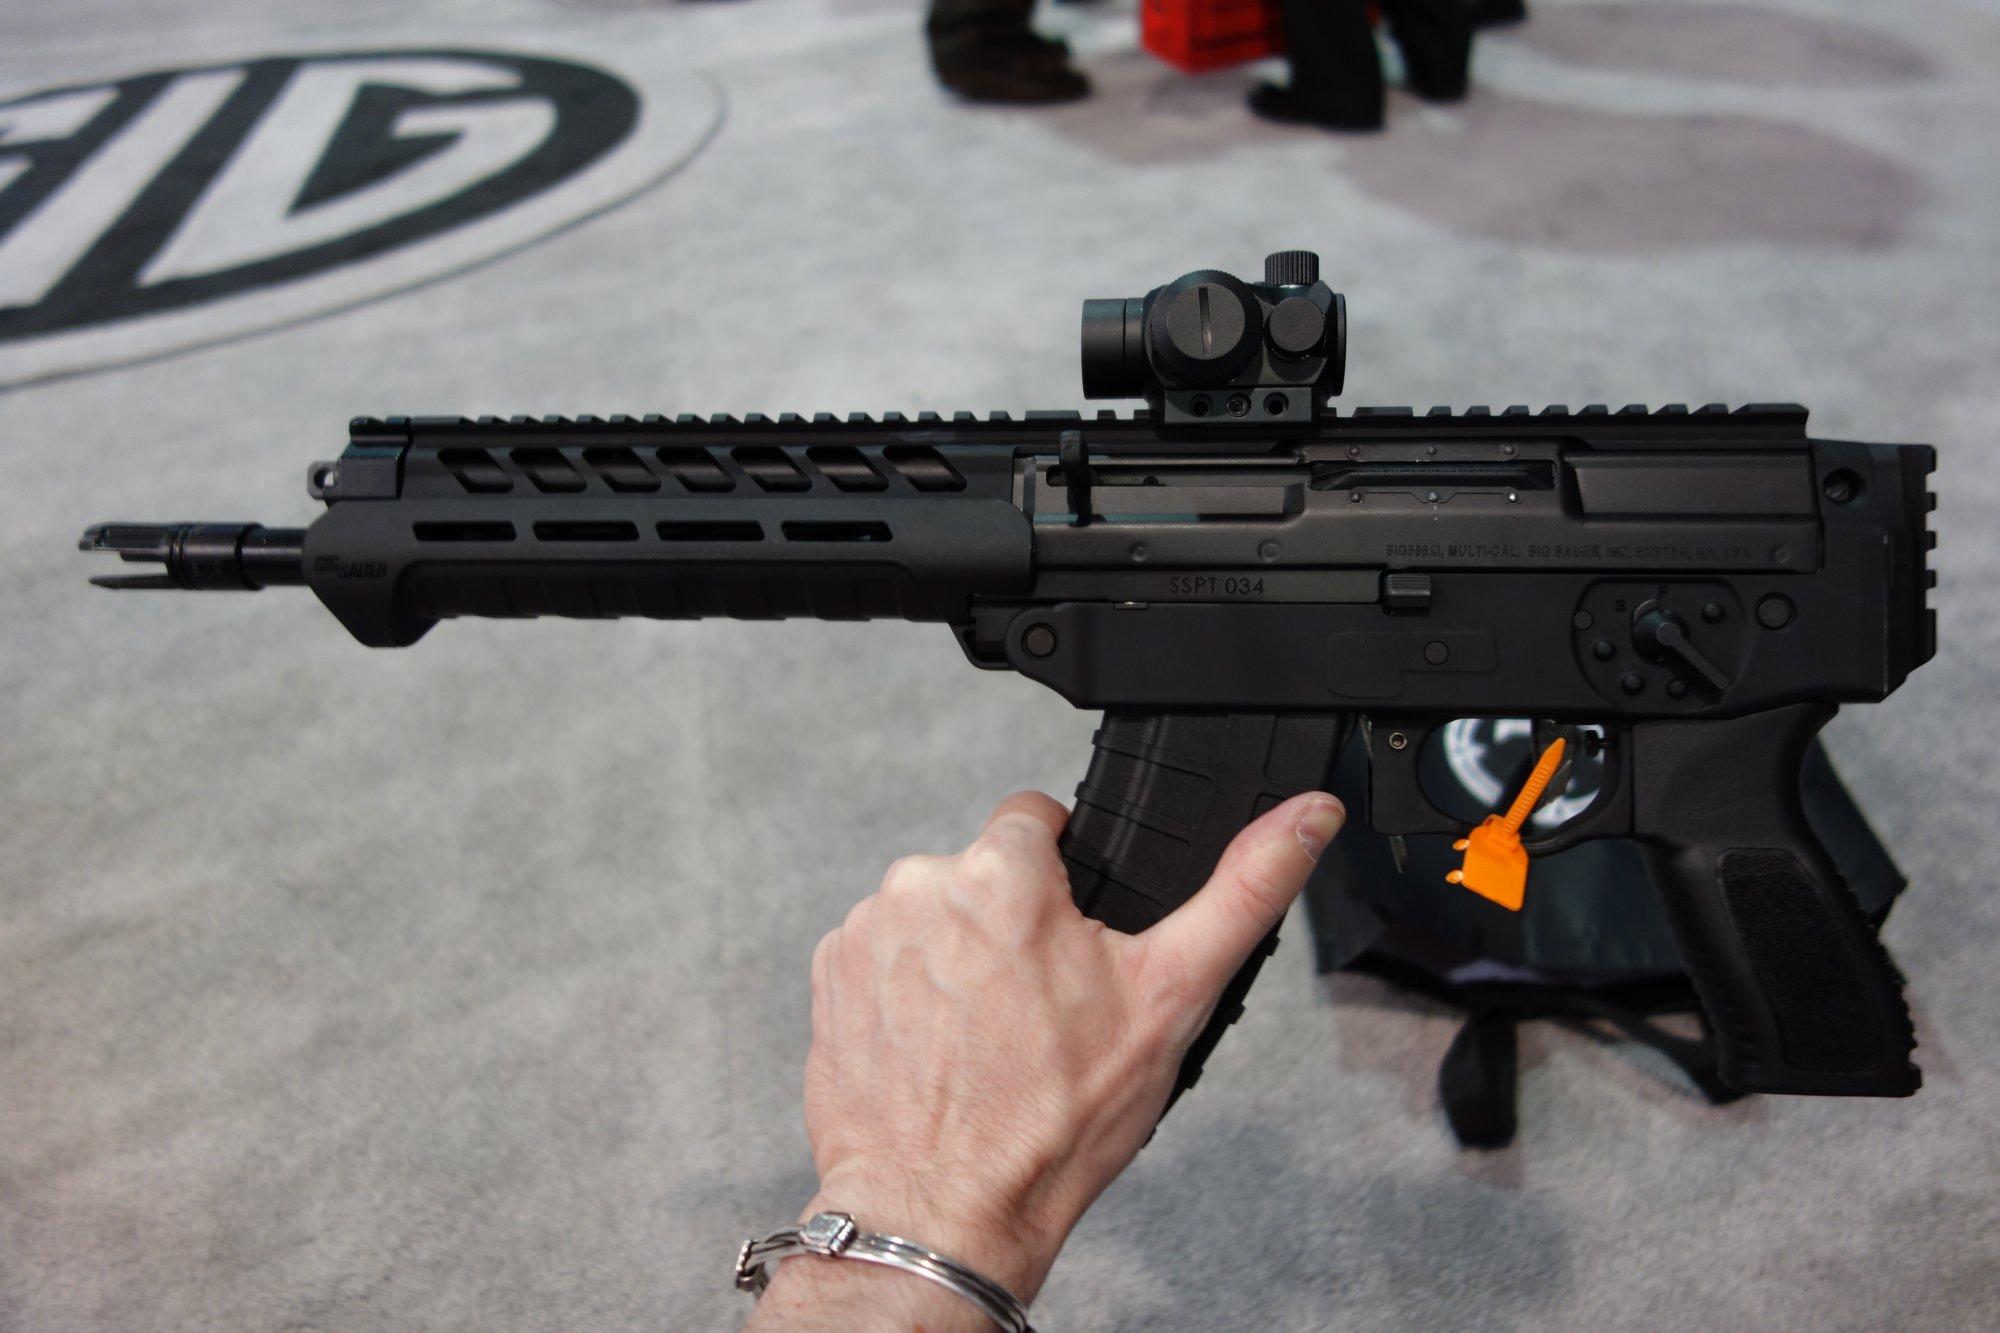 SIG SAUER SIG556xi 7.62x39mm Russian Configuration Semi Auto Only Modular Multi Caliber Combat Tactical Carbine Kalashnikov AK 47 AKM SHOT Show 2014 1 15 14 David Crane DefenseReview.com DR 14 SIG SAUER SIG556xi Modular, Multi Caliber (5.56mm NATO, 300 AAC Blackout/300BLK, 7.62x39mm Russian) Gas Piston/Op Rod Combat/Tactical Rifle/Carbine/SBR with Kalashnikov AK 47/AKM Configuration Capability!